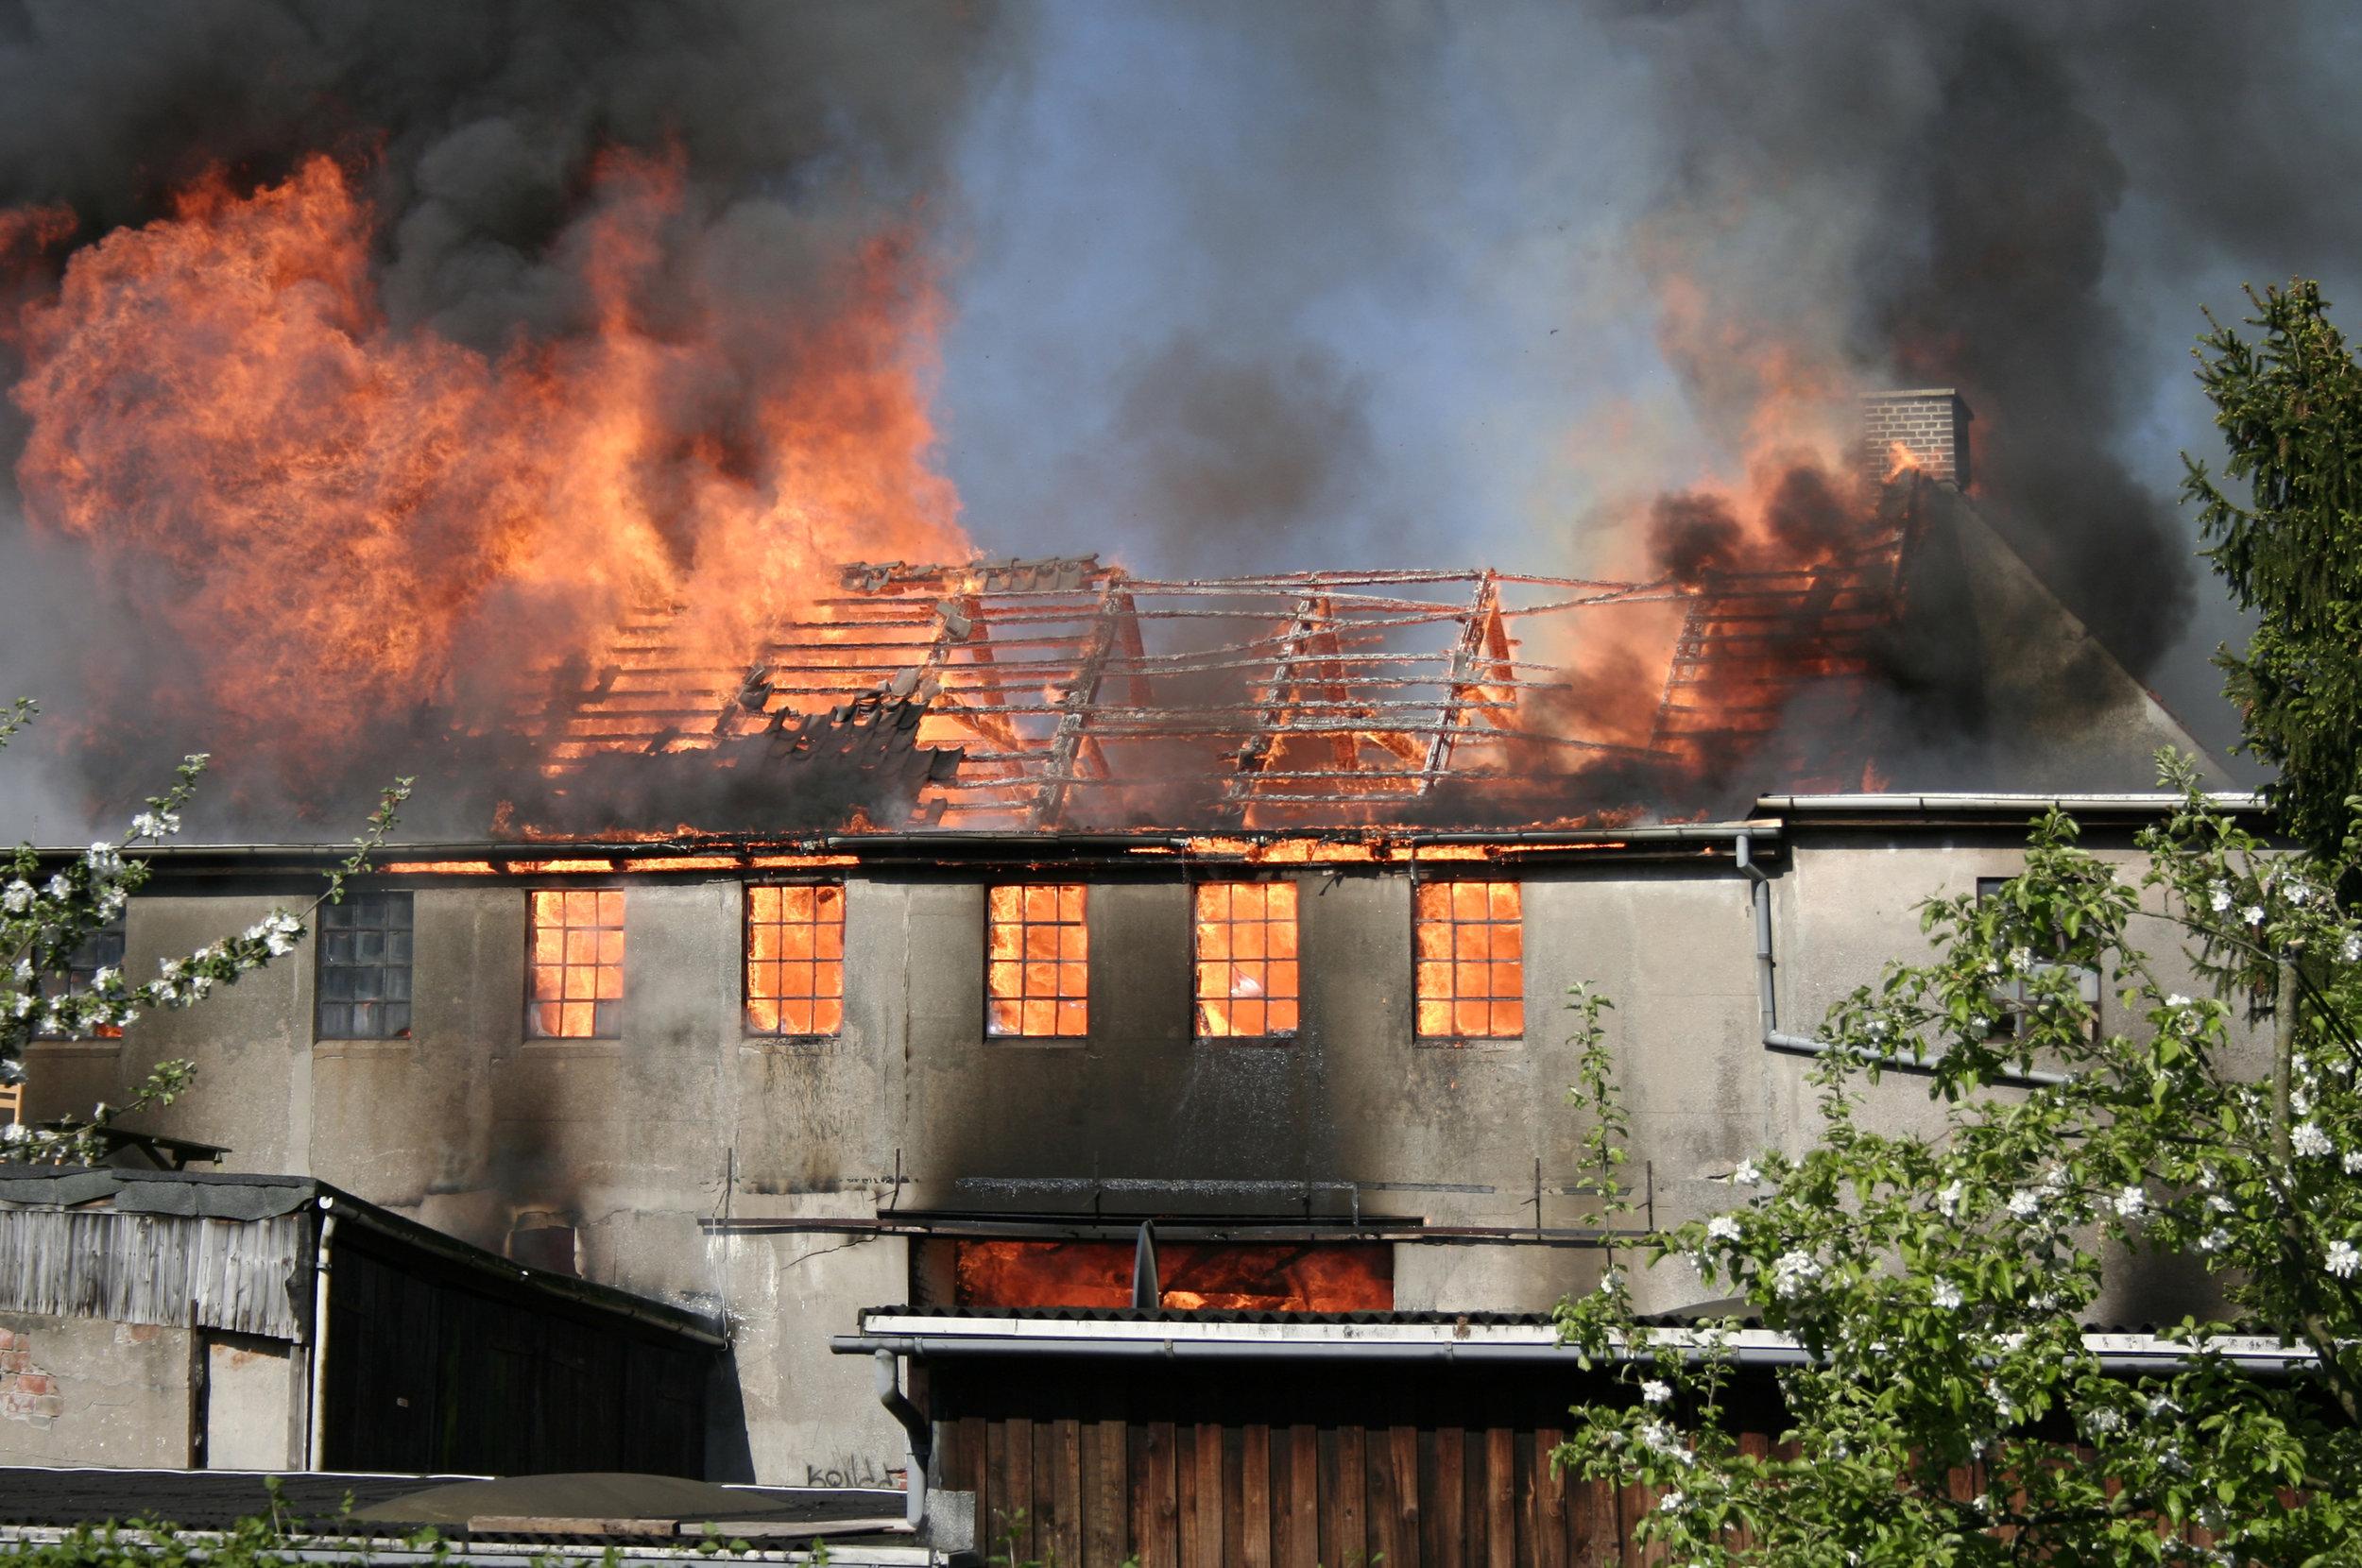 building-on-fire-1211010.jpg